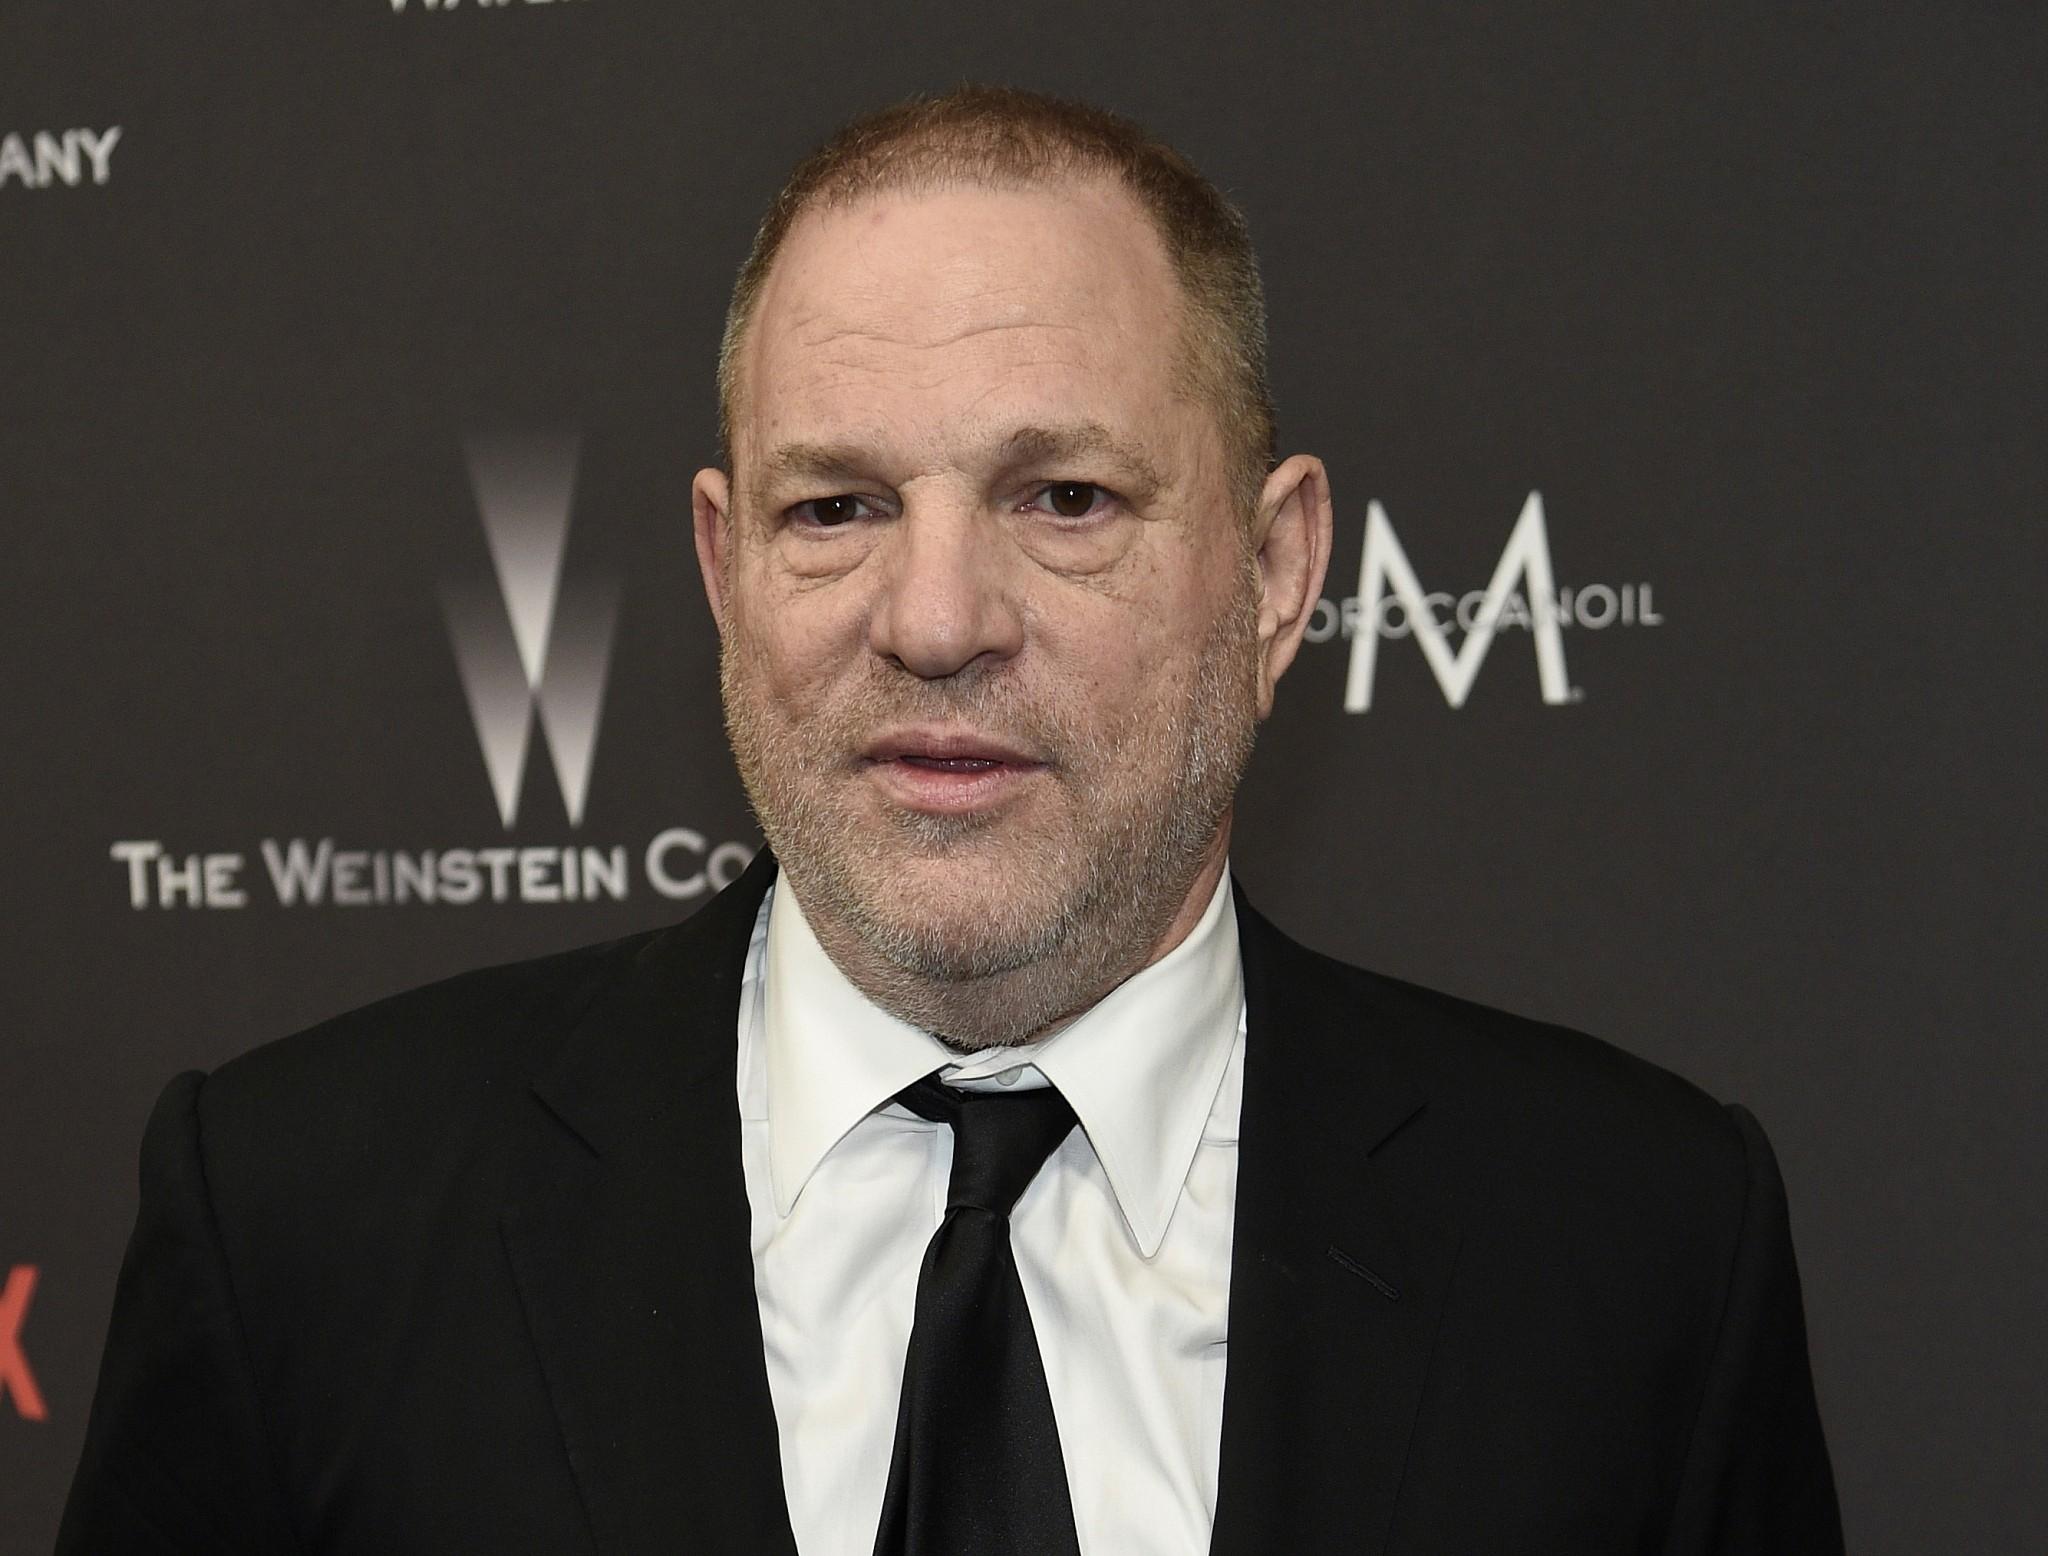 NY attorney general sues The Weinstein Company, Harvey Weinstein